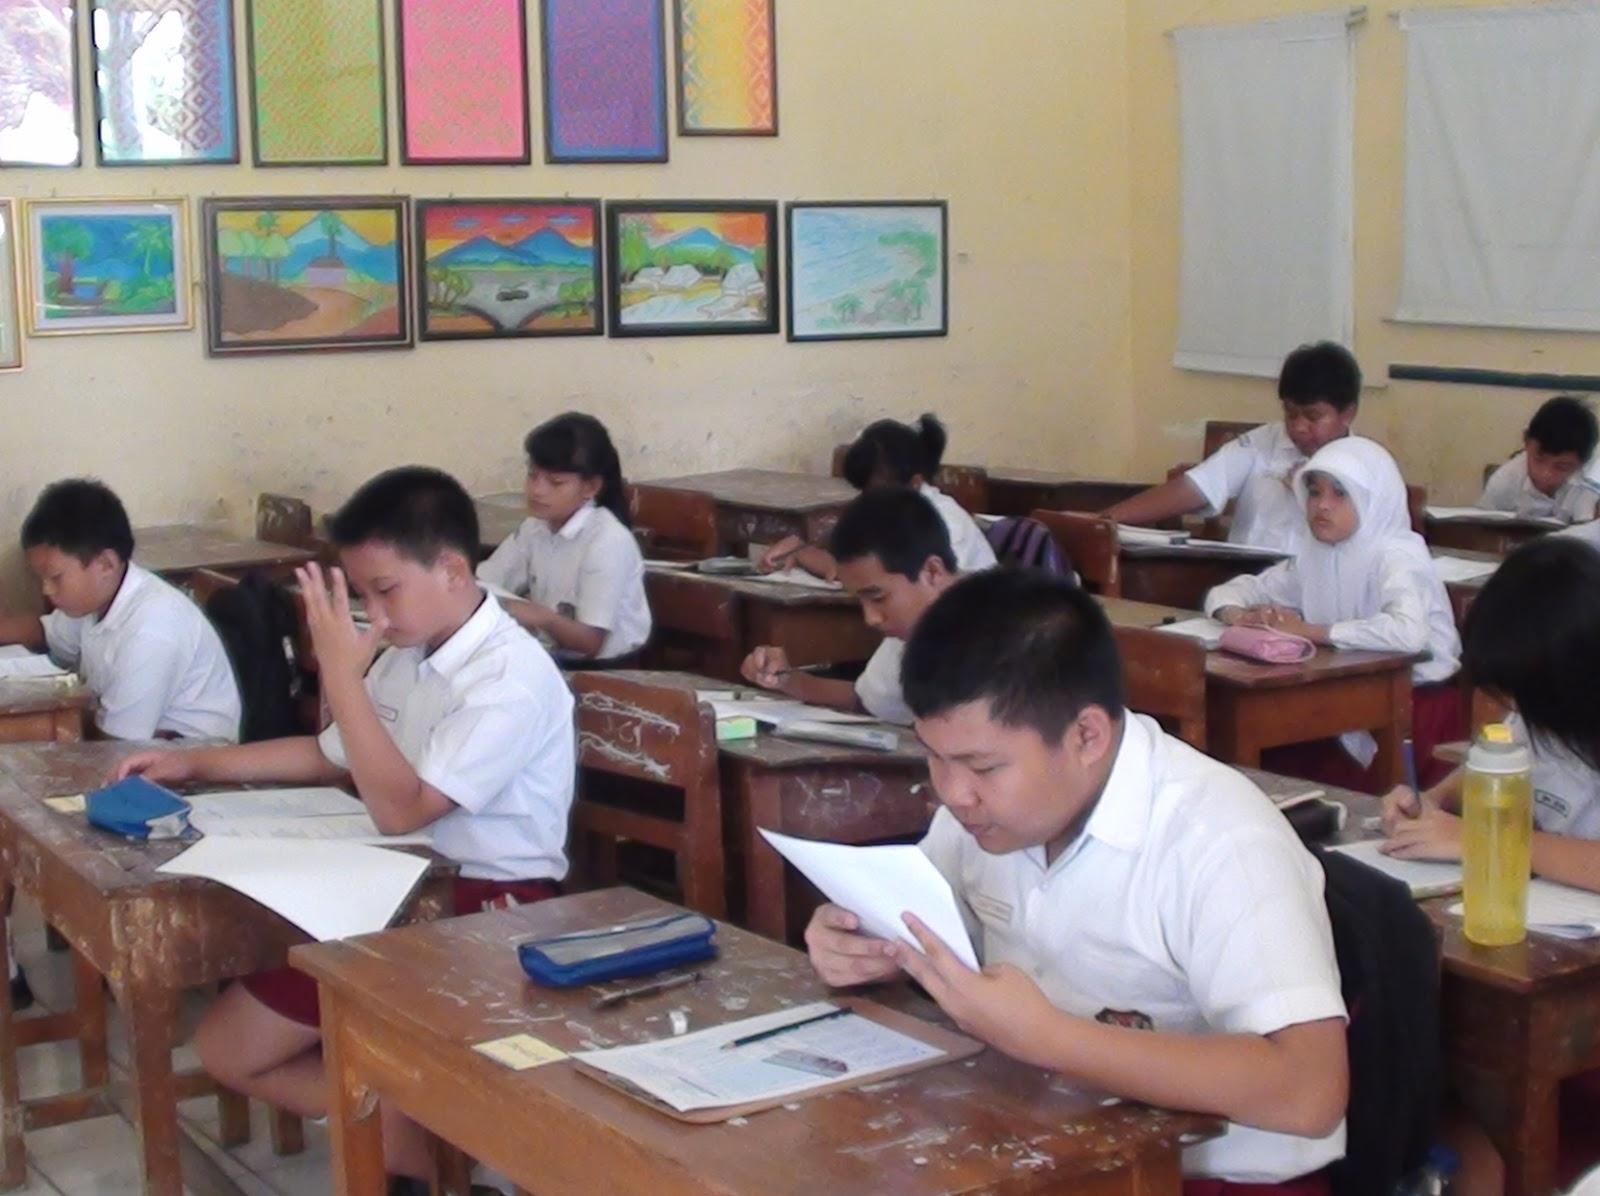 Sdn Slawi Kulon 03 Sekolah Unggulan Kab Tegal Pelaksanaan Ujian Sekolah Sd Mi Tahun 2013